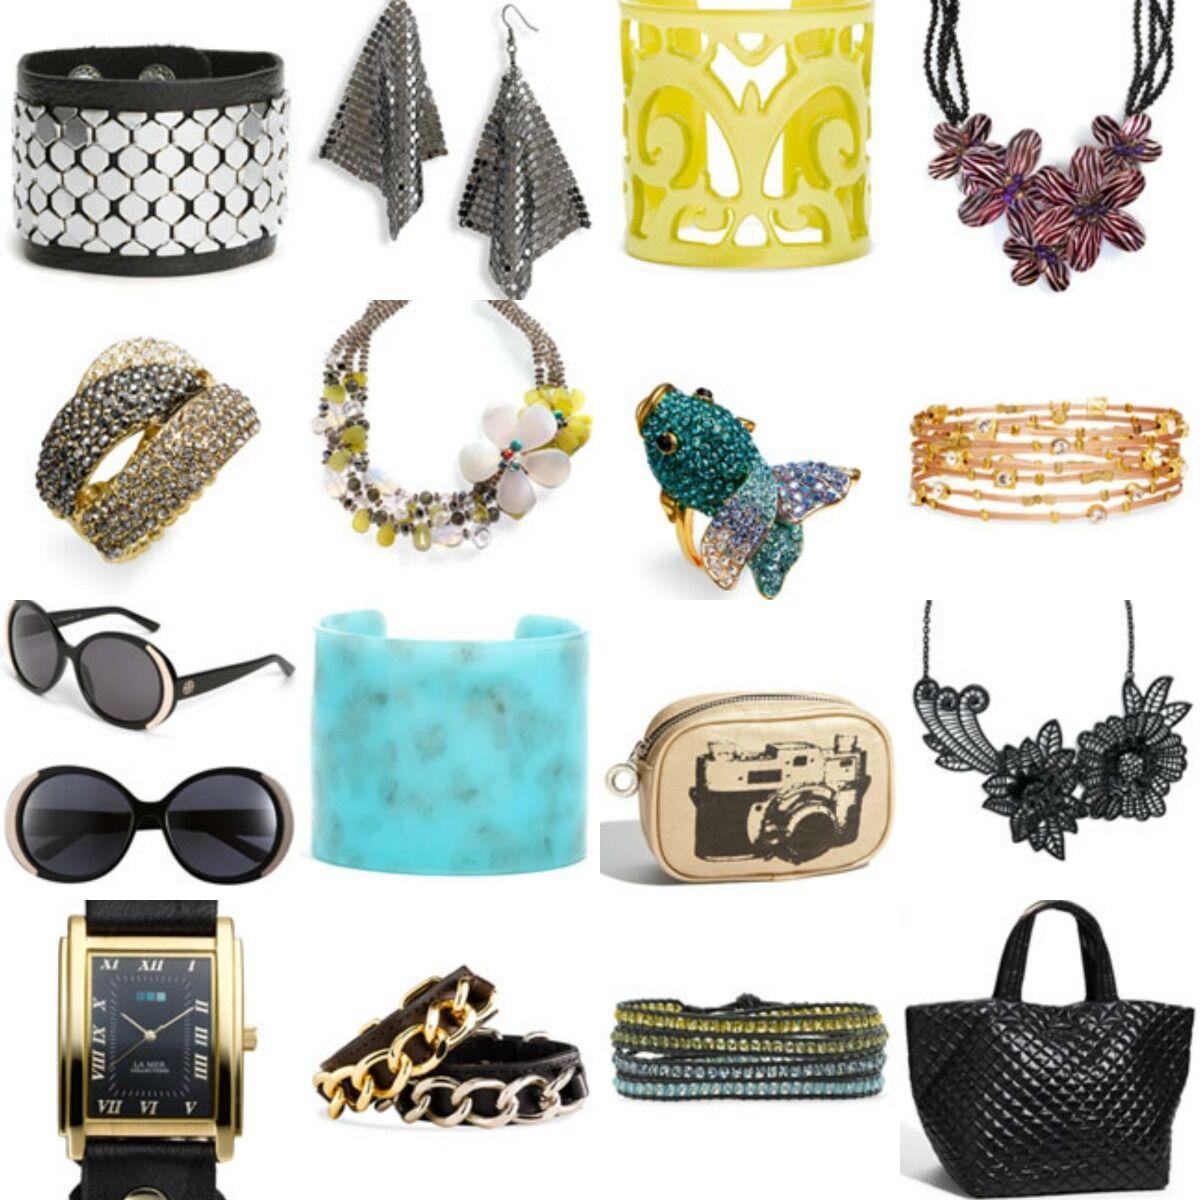 Twynglobal Merchandise